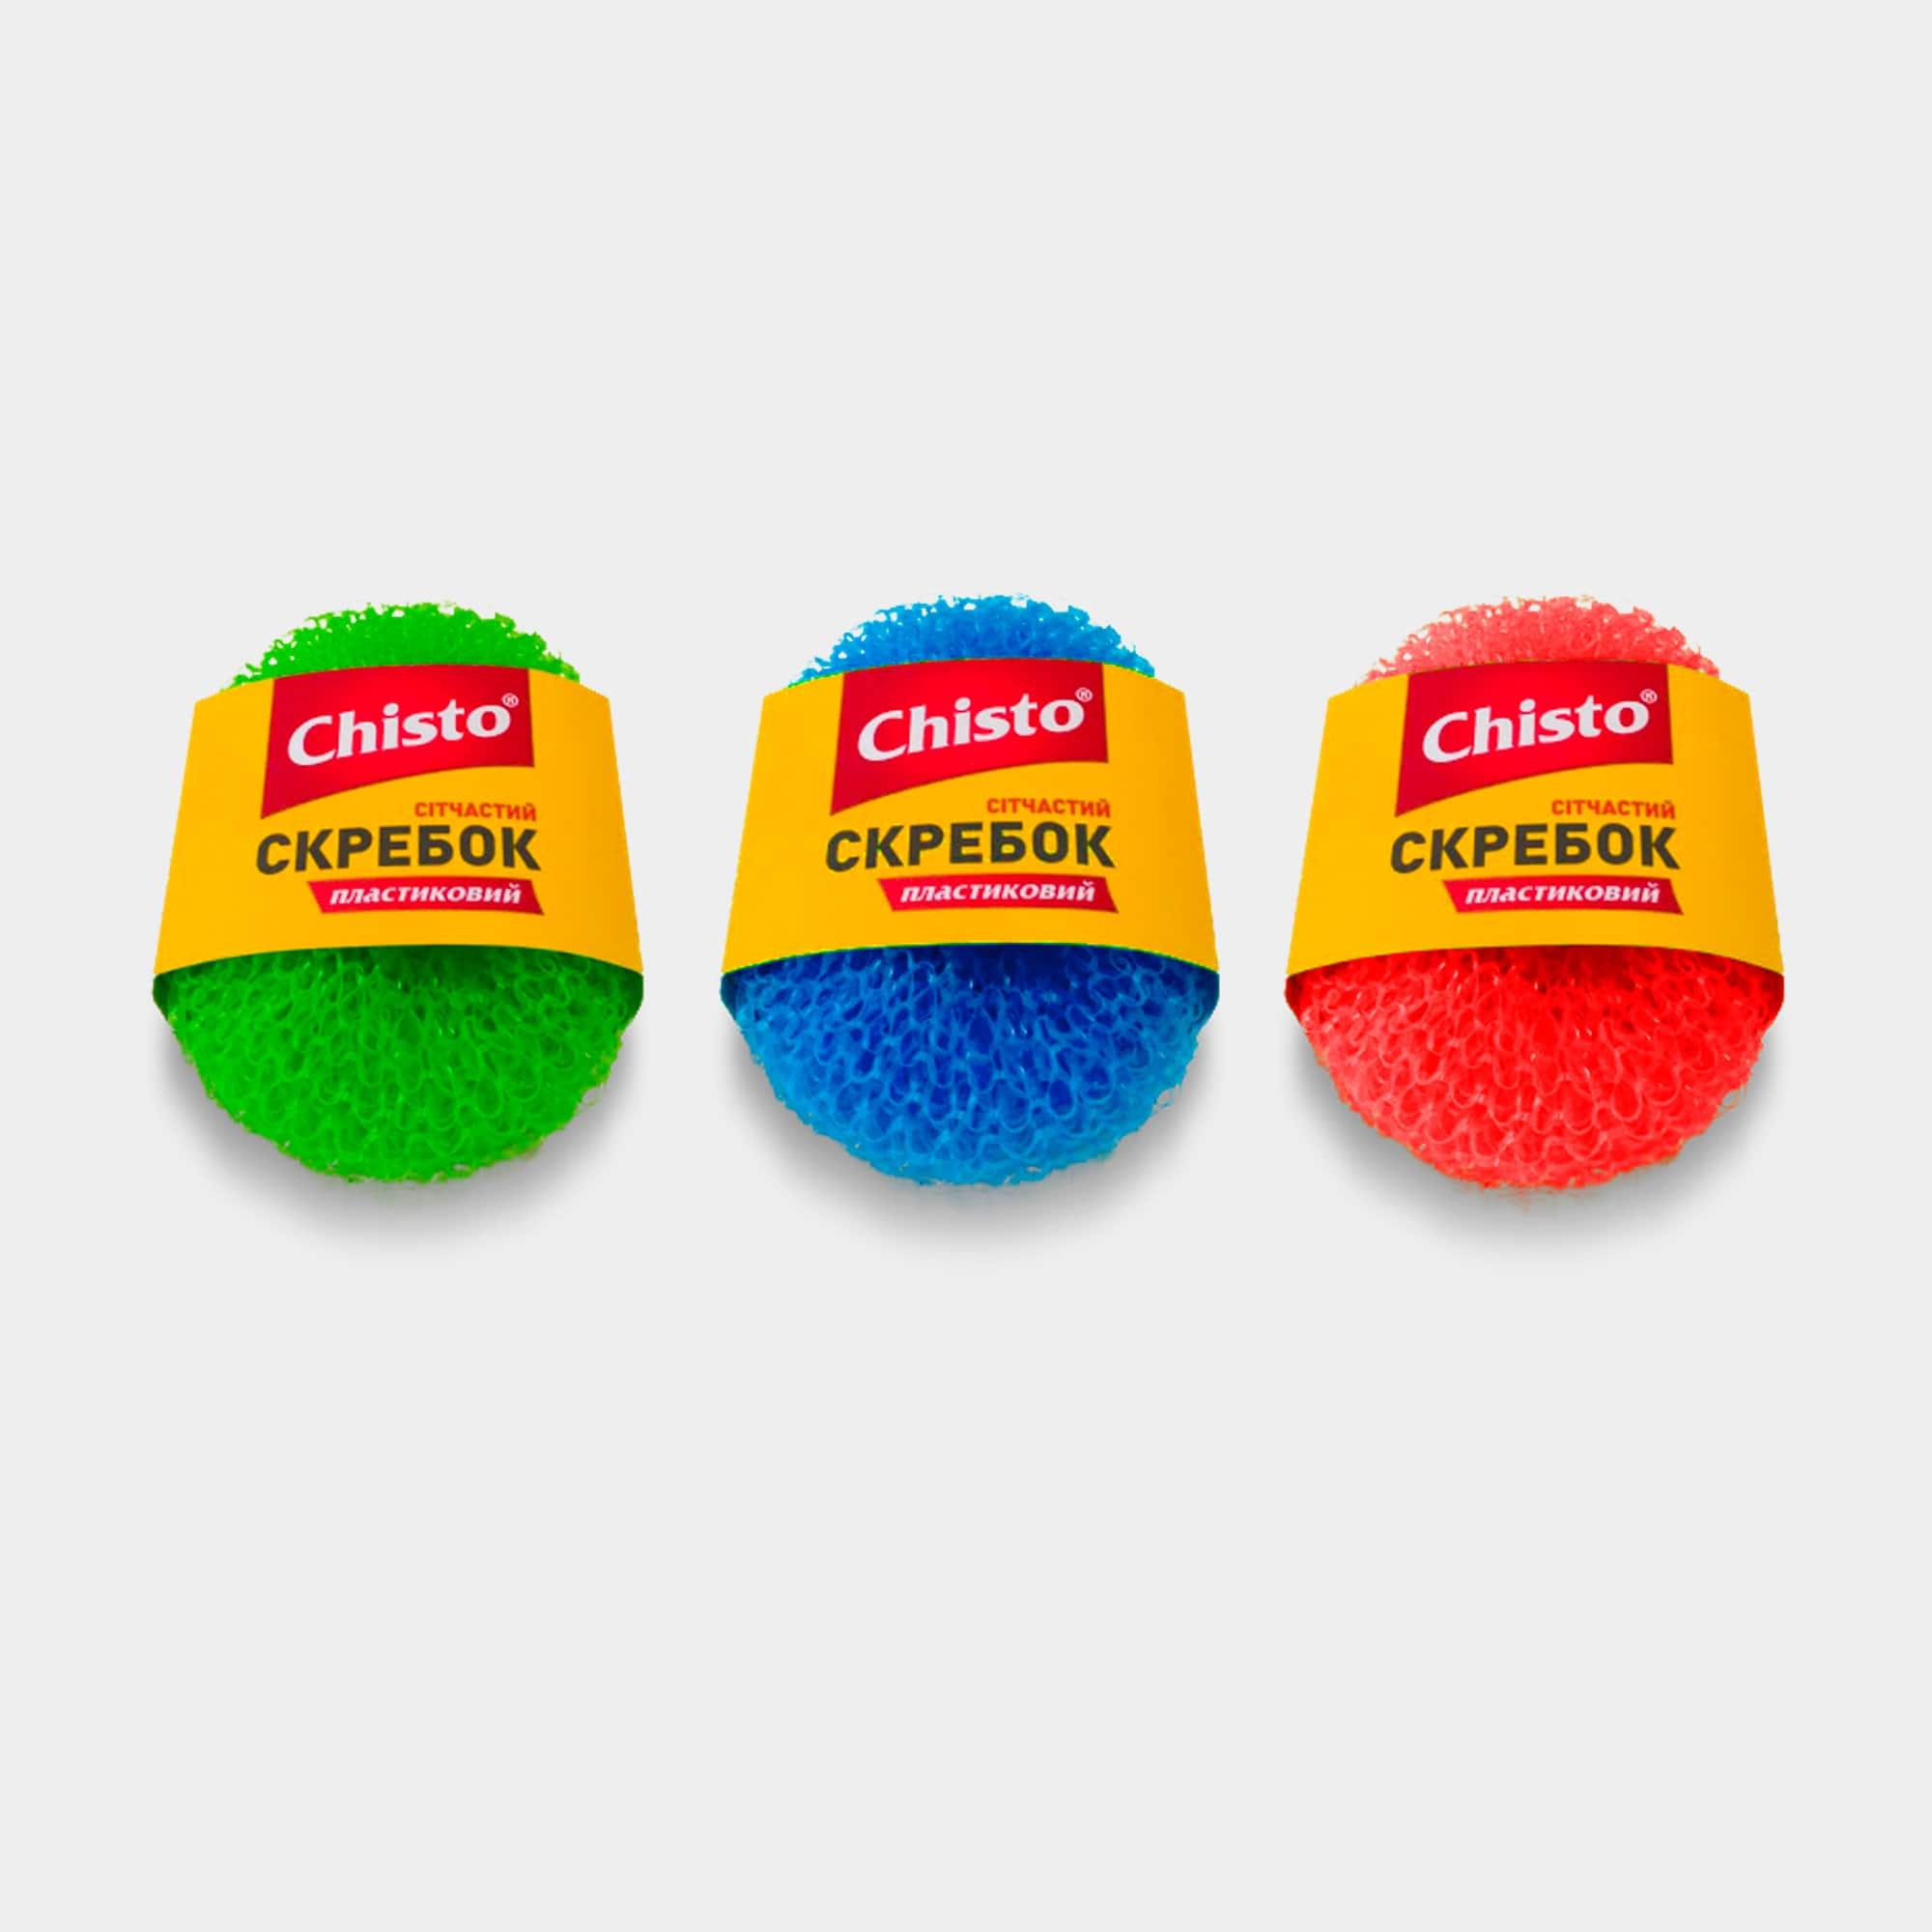 Скребок пластиковый сетчатый ТМ «Chisto», 1 шт. | Продукция ТМ Chisto